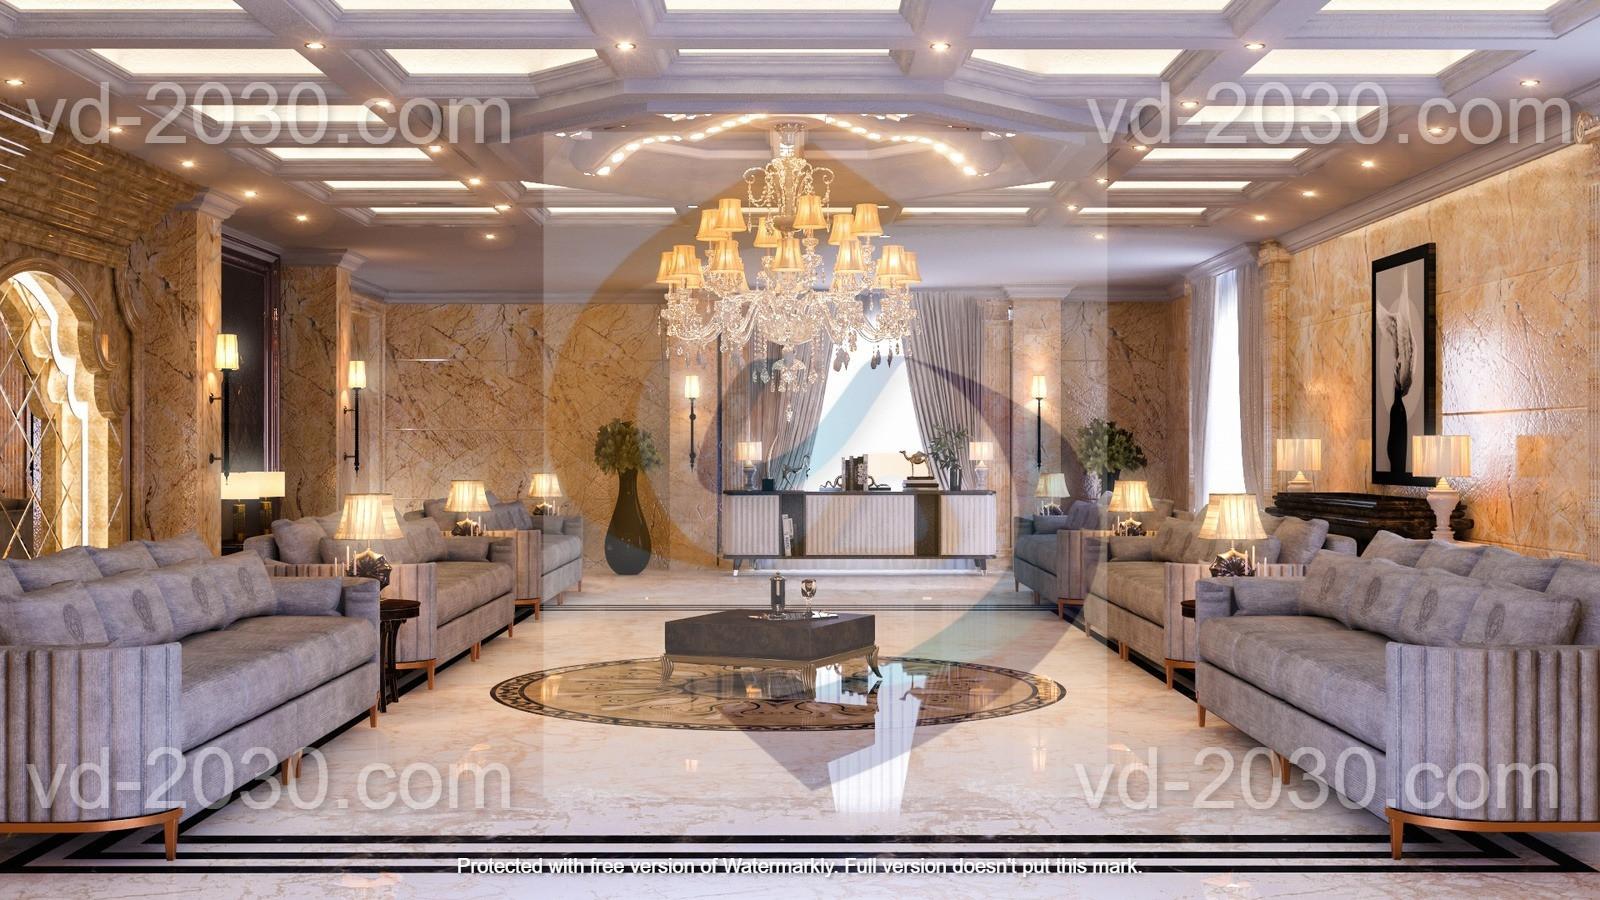 Al-Ghamdi reception hall  - vision dimensions - ابعاد الرؤية